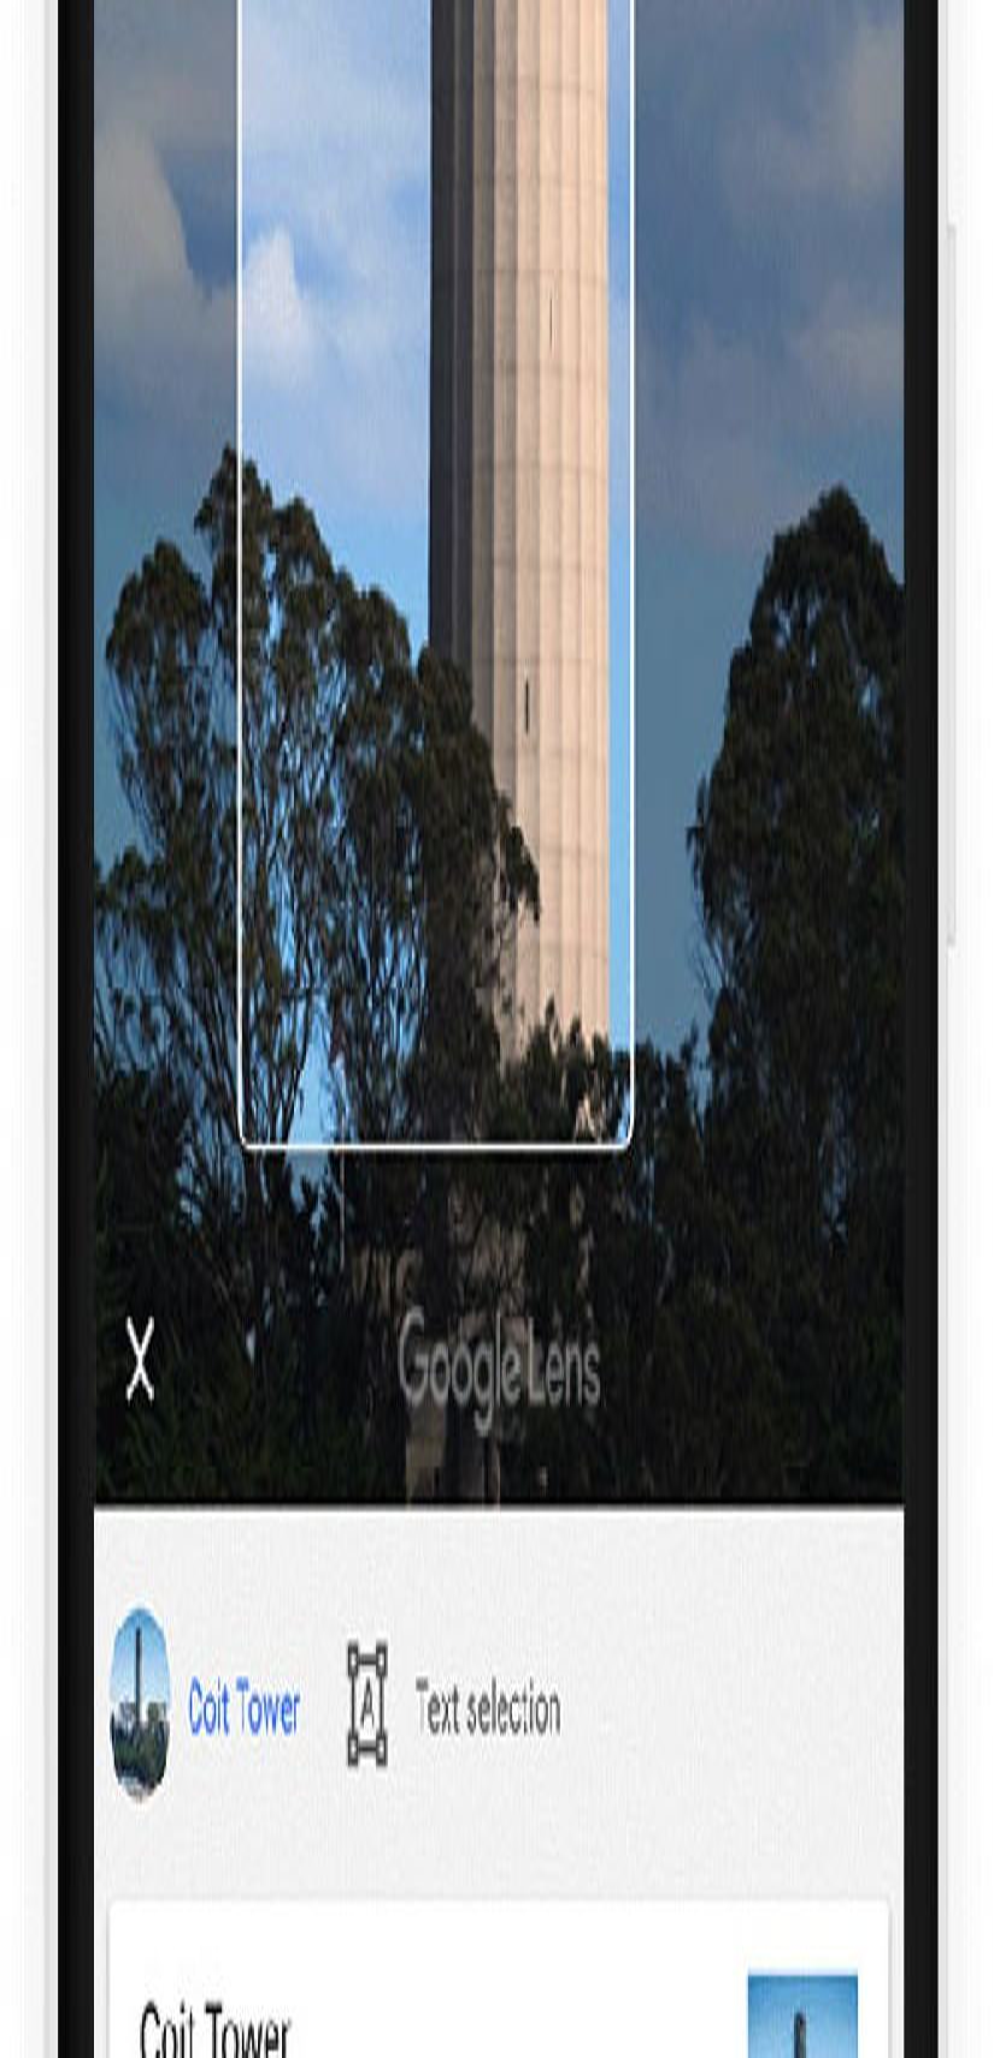 Google Lens: Διαθέσιμο το έξυπνο εργαλείο μέσα από το Google Photos για όλα τα Android smartphones και σύντομα για iOS